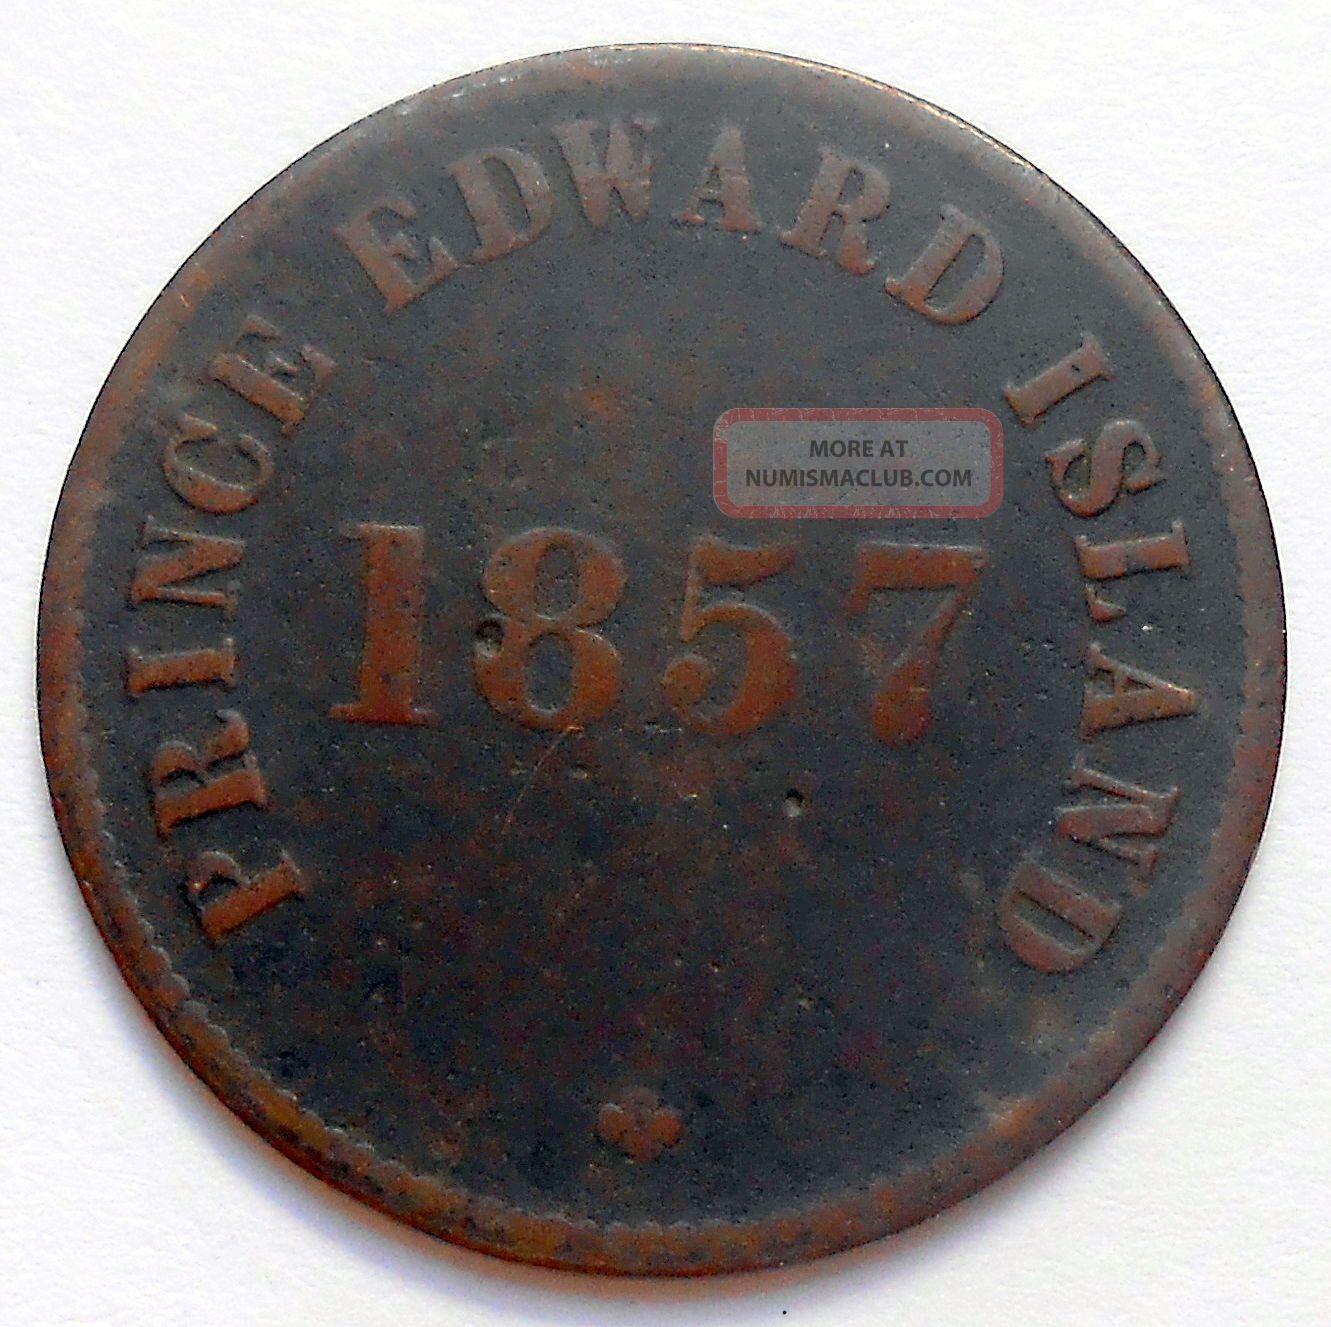 1857 Prince Edward Island Self Government Token Vg Pe - 7c5 Scarce Variety Coin Coins: Canada photo